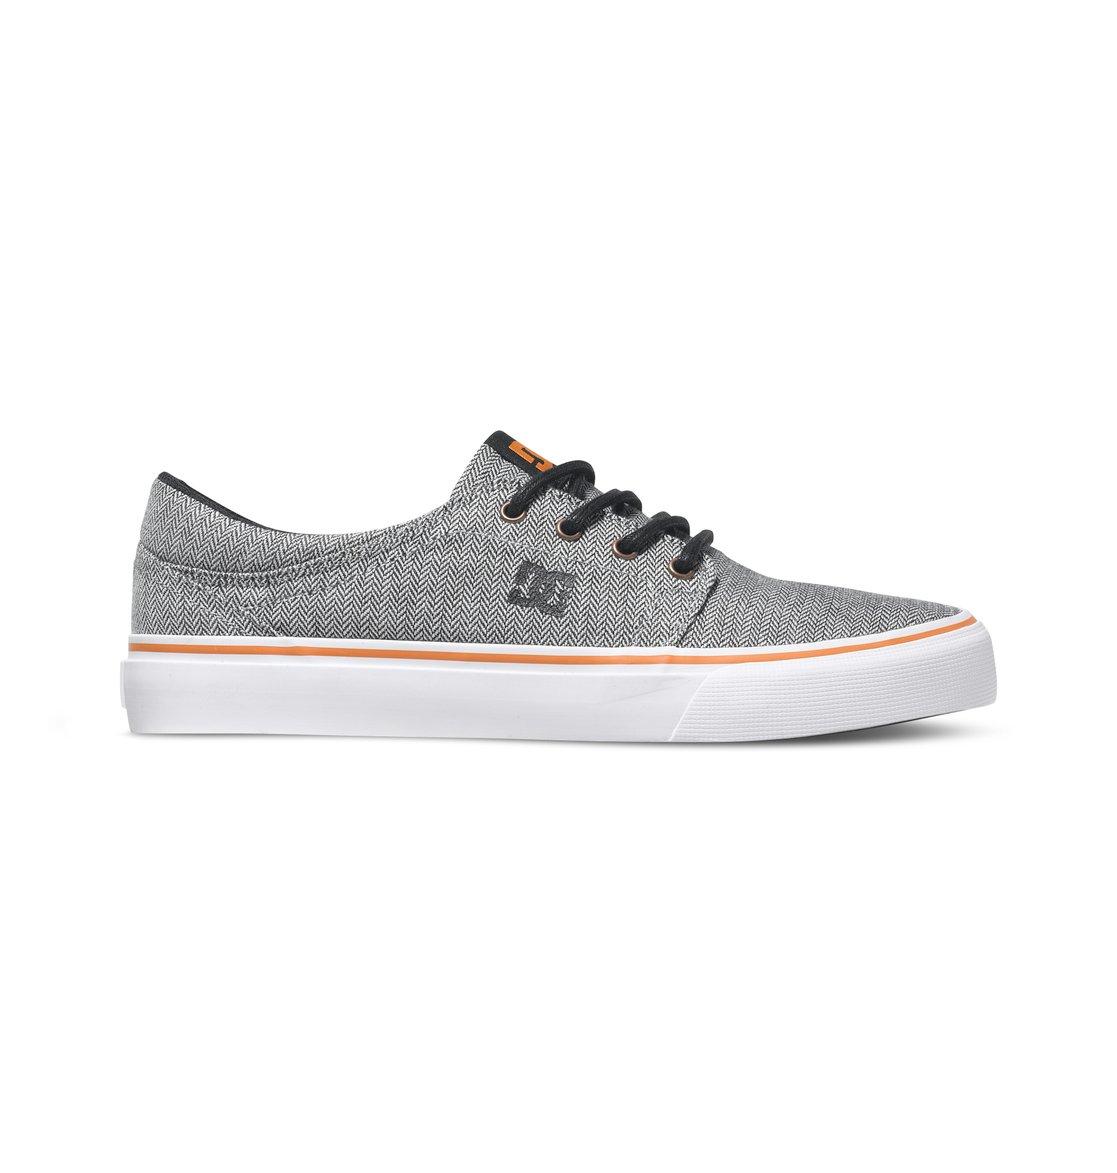 Trase TX SE от DC Shoes